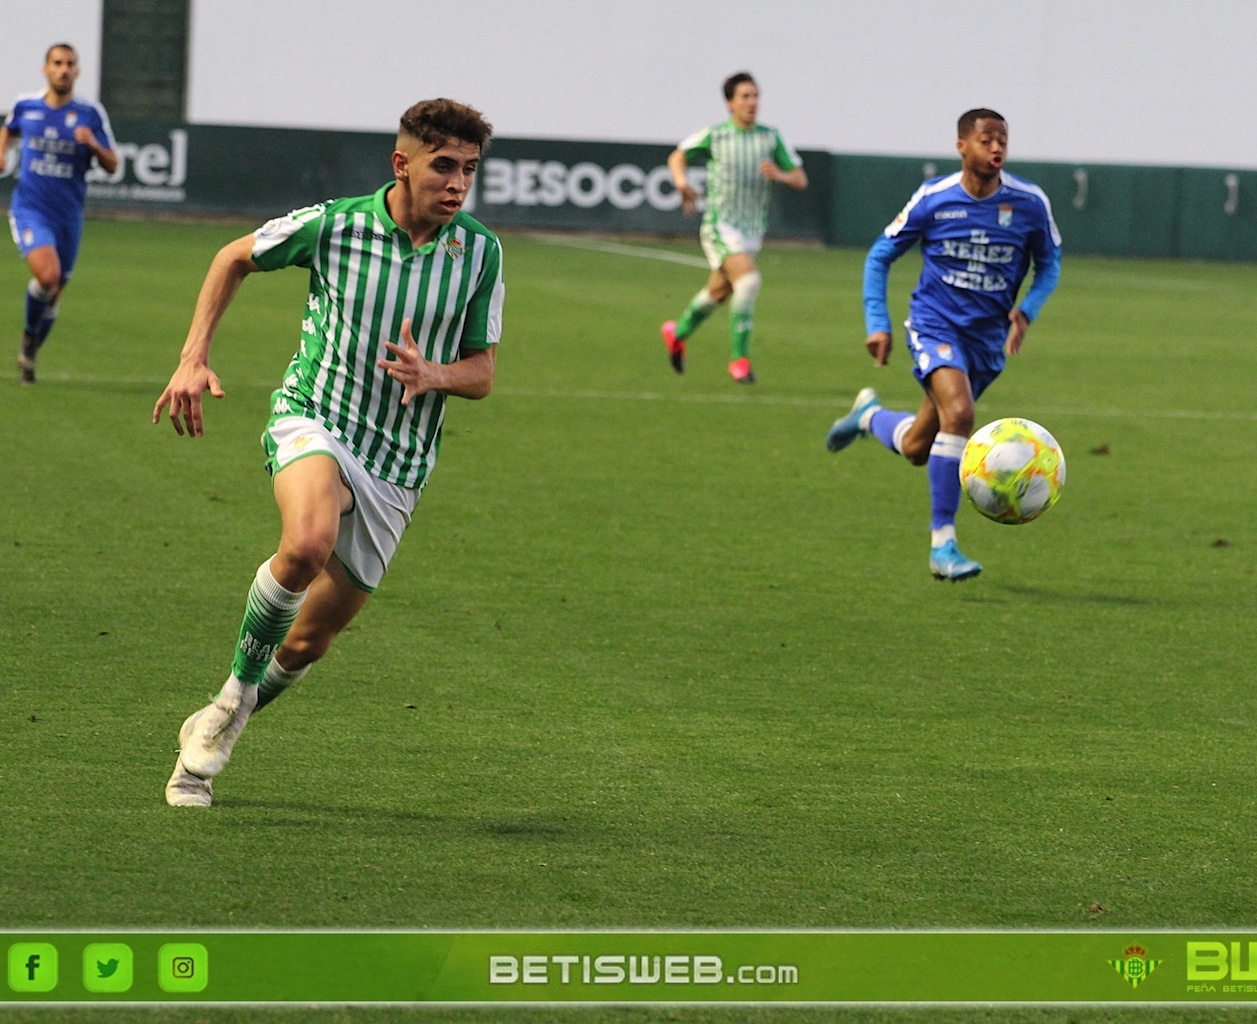 J23 Betis Deportivo - Xerez 155